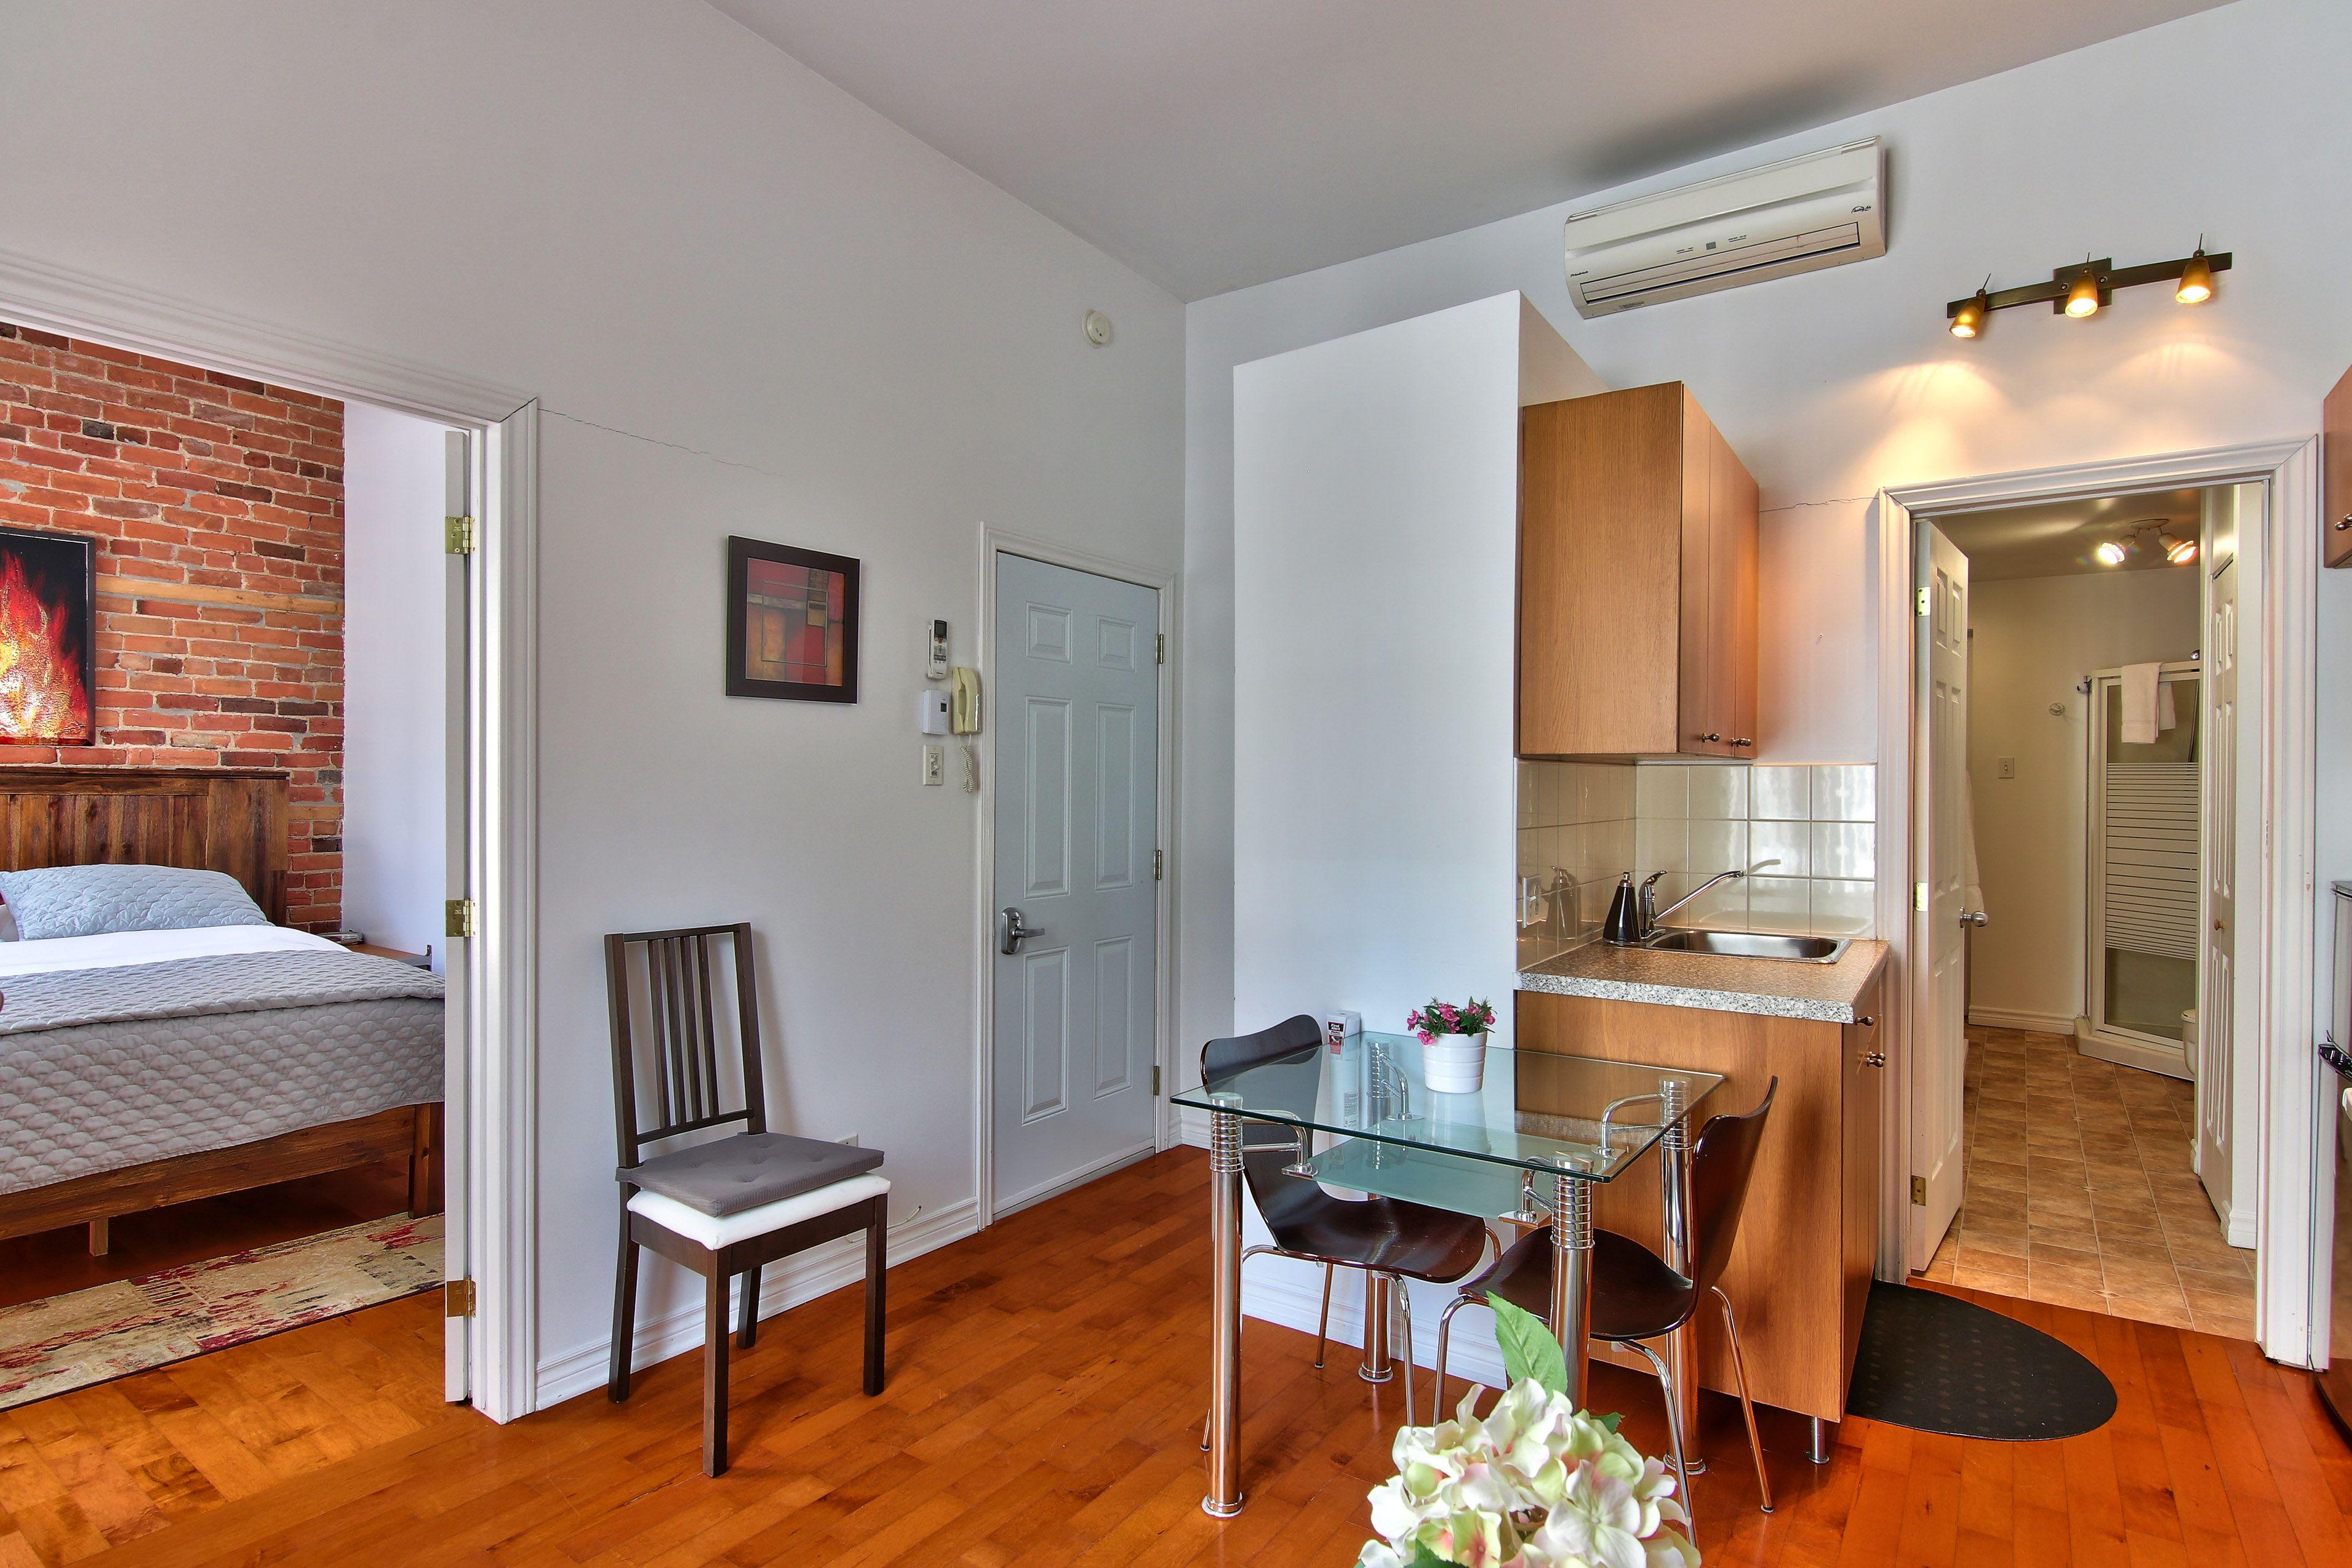 hotel-proche-palais-des-congres-montreal-appartement-1-chambre-salle-a-manger